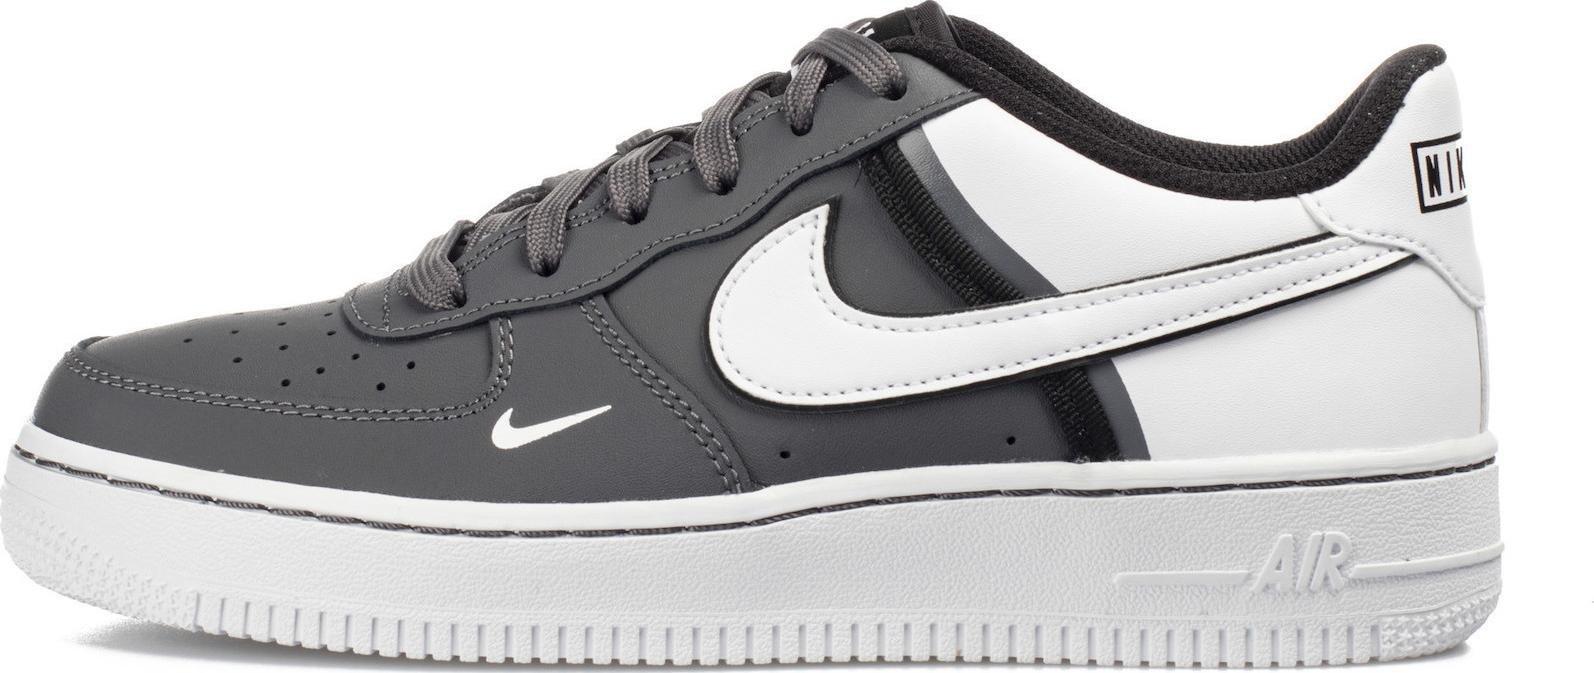 Shoes Nike AIR FORCE 1 LV8 2 (GS) - Top4Football.com